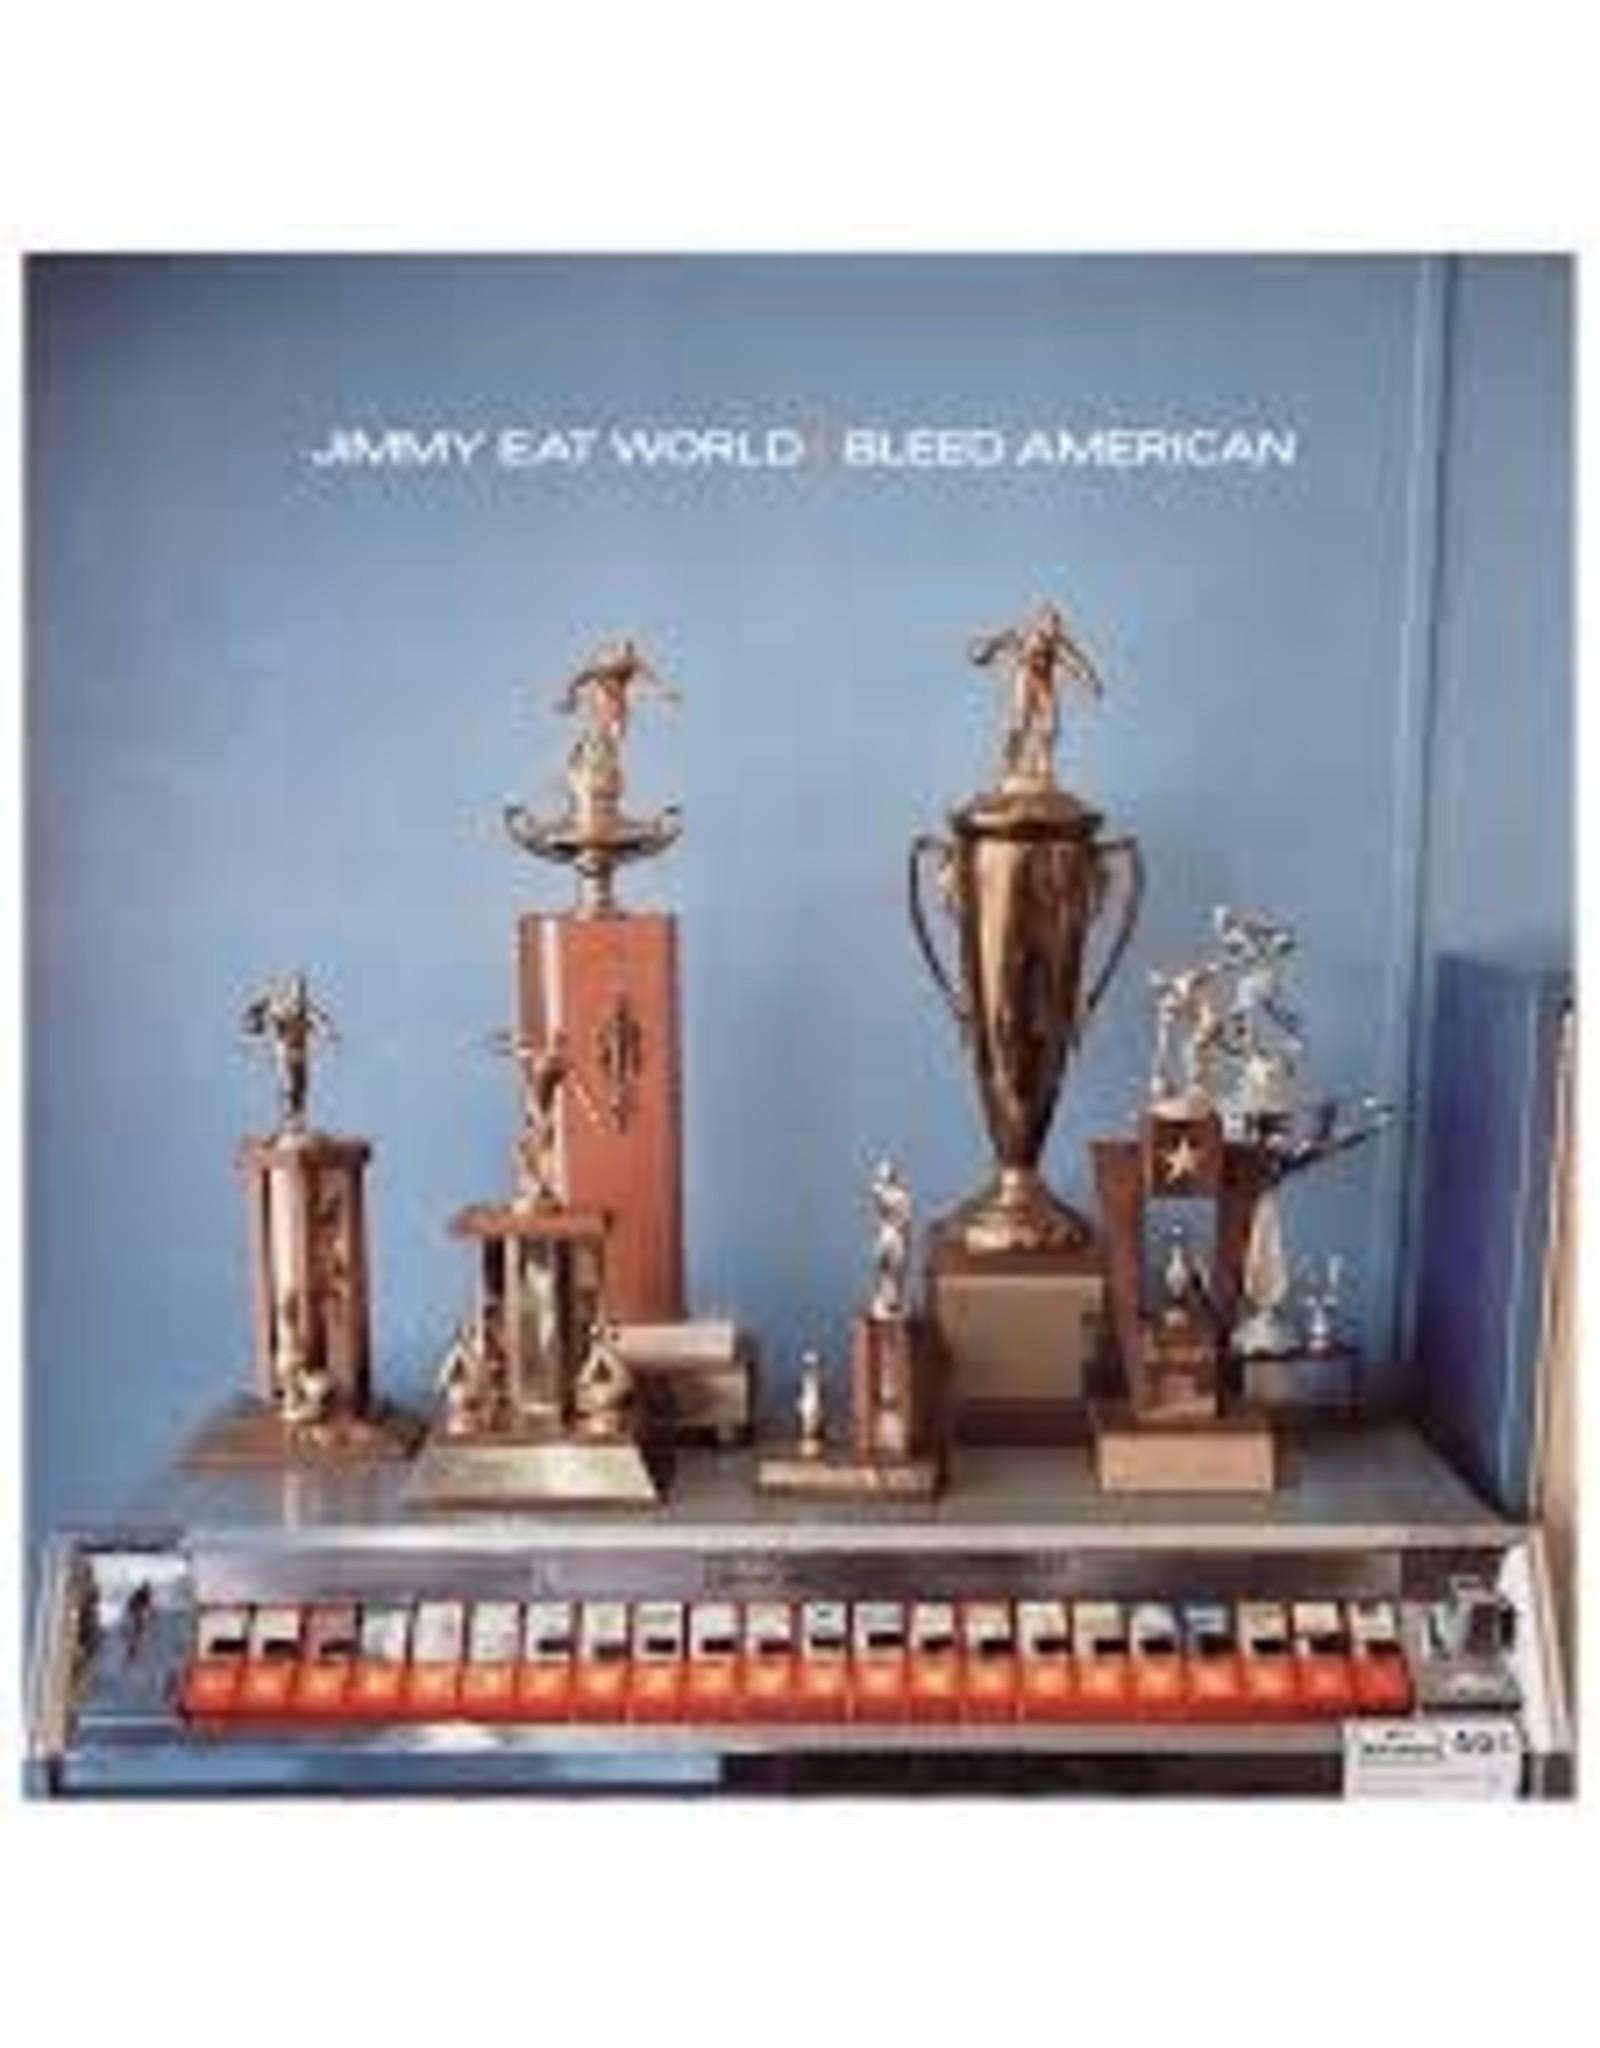 Vinyl Jimmy Eat World - Bleed American